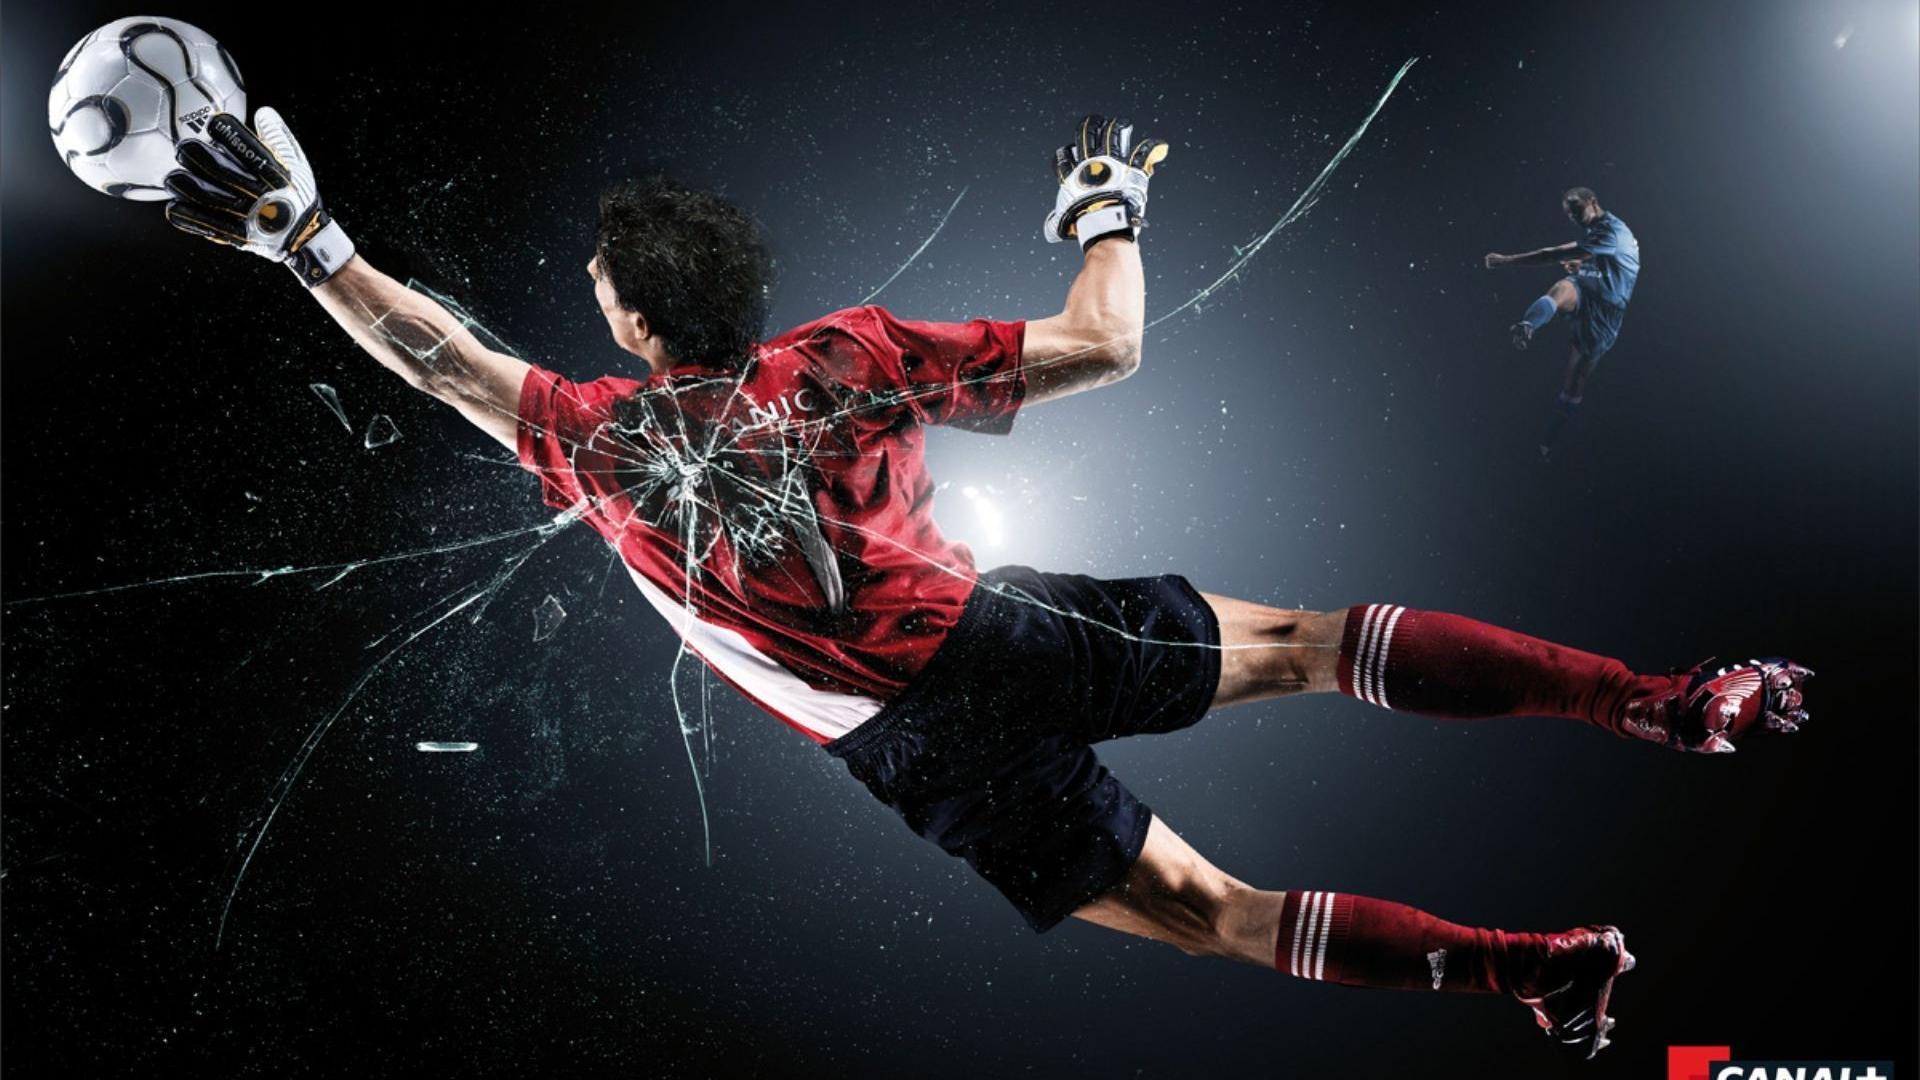 50 Goalkeeper Wallpapers   Download at WallpaperBro 1920x1080